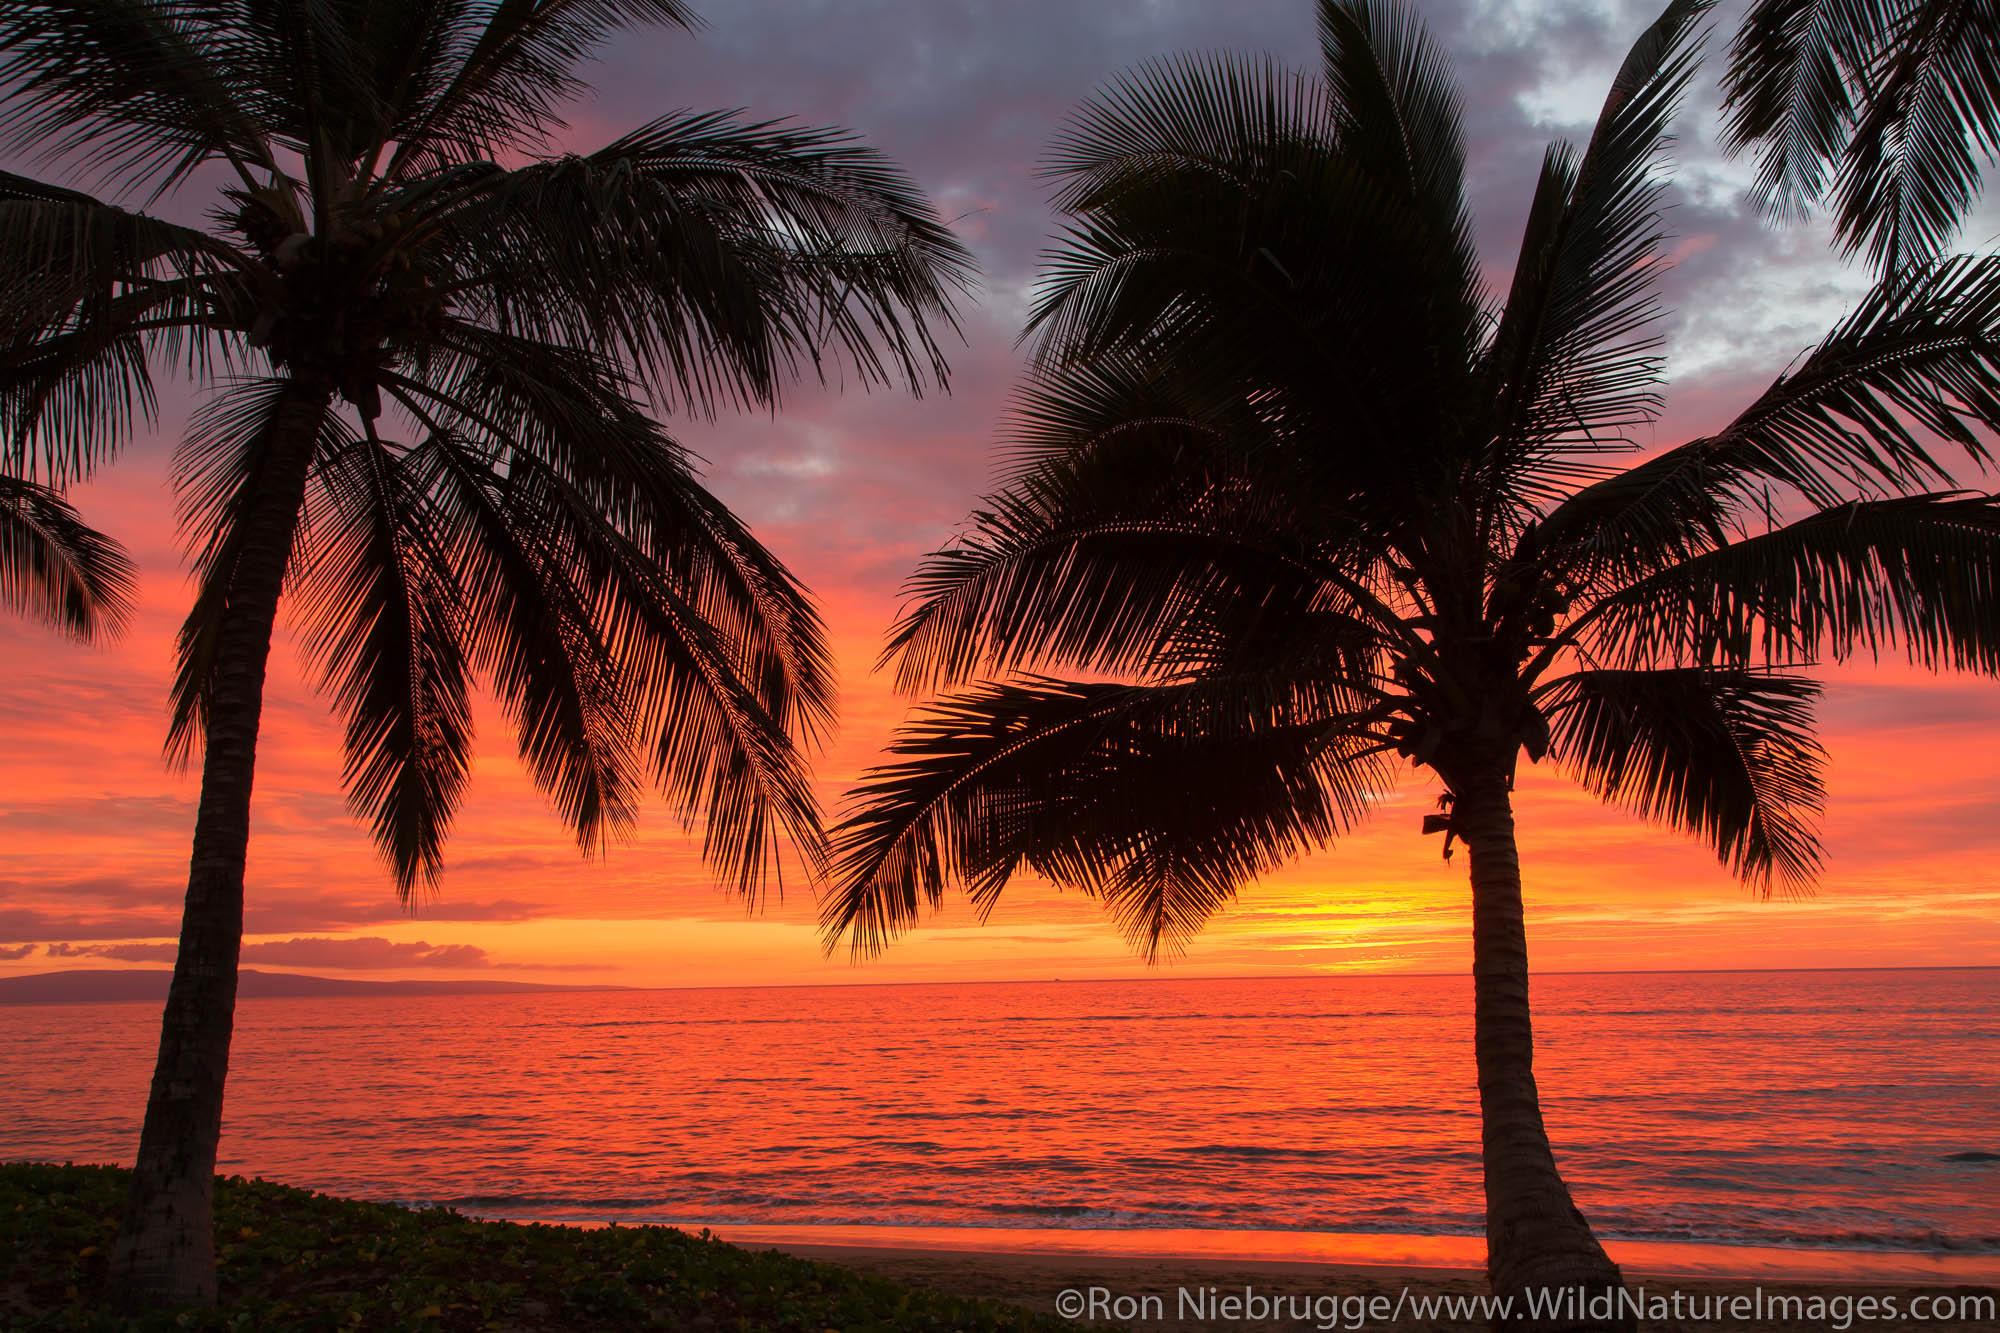 Maui, Hawaii, photos, Americas, Hawaiian, Mai Poina 'Oe La'u Beach Park, Mai Poina Oe Lau Beach Park, North America, North American...